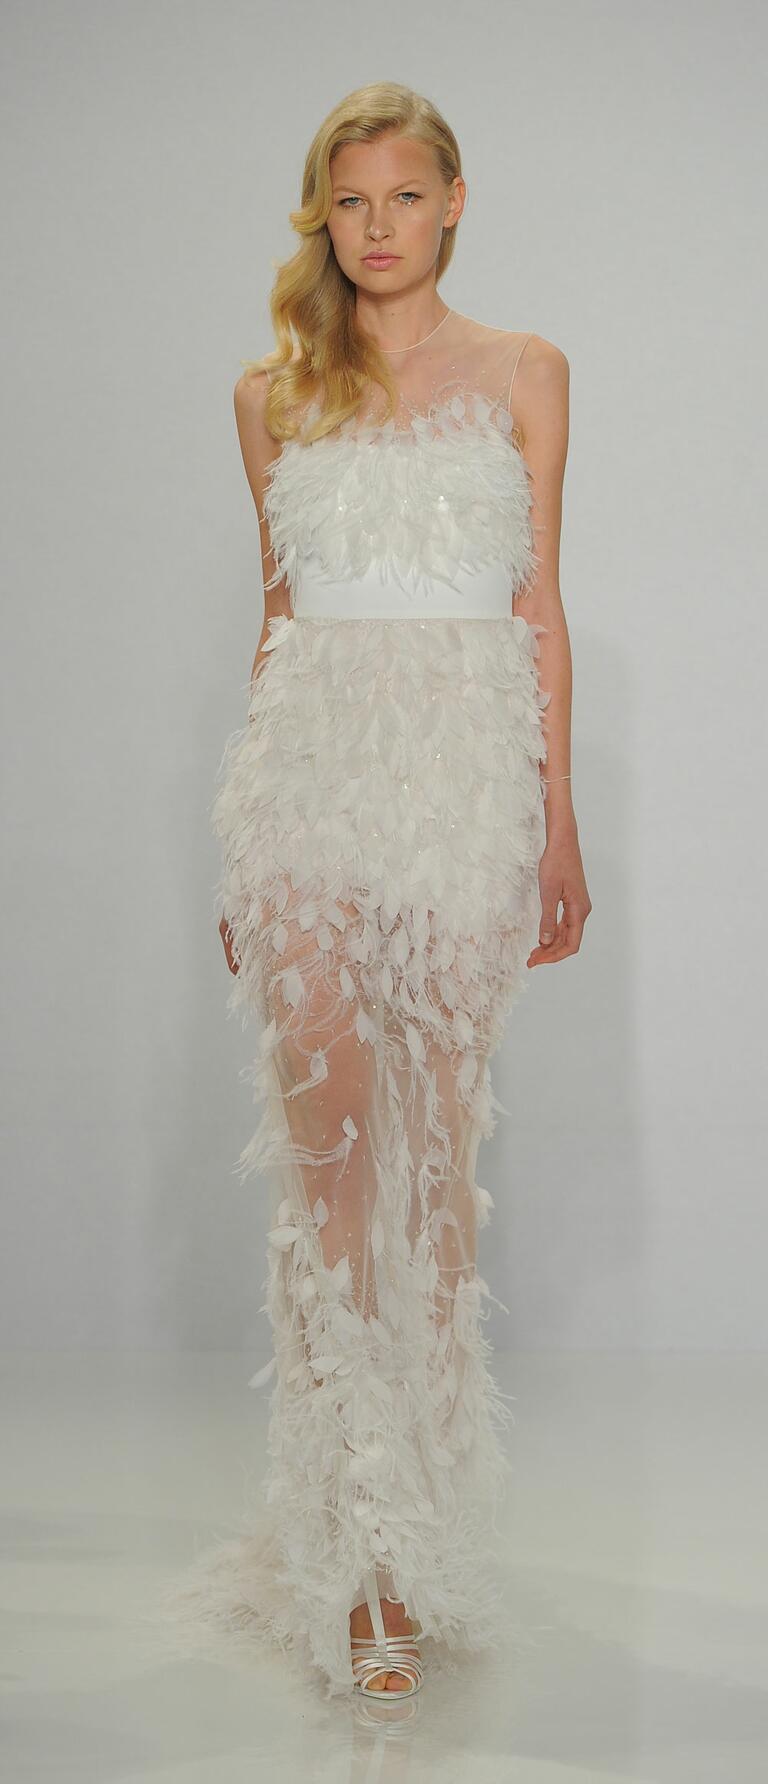 Christian Siriano Spring 2017 feather appliqué column gown wedding dress